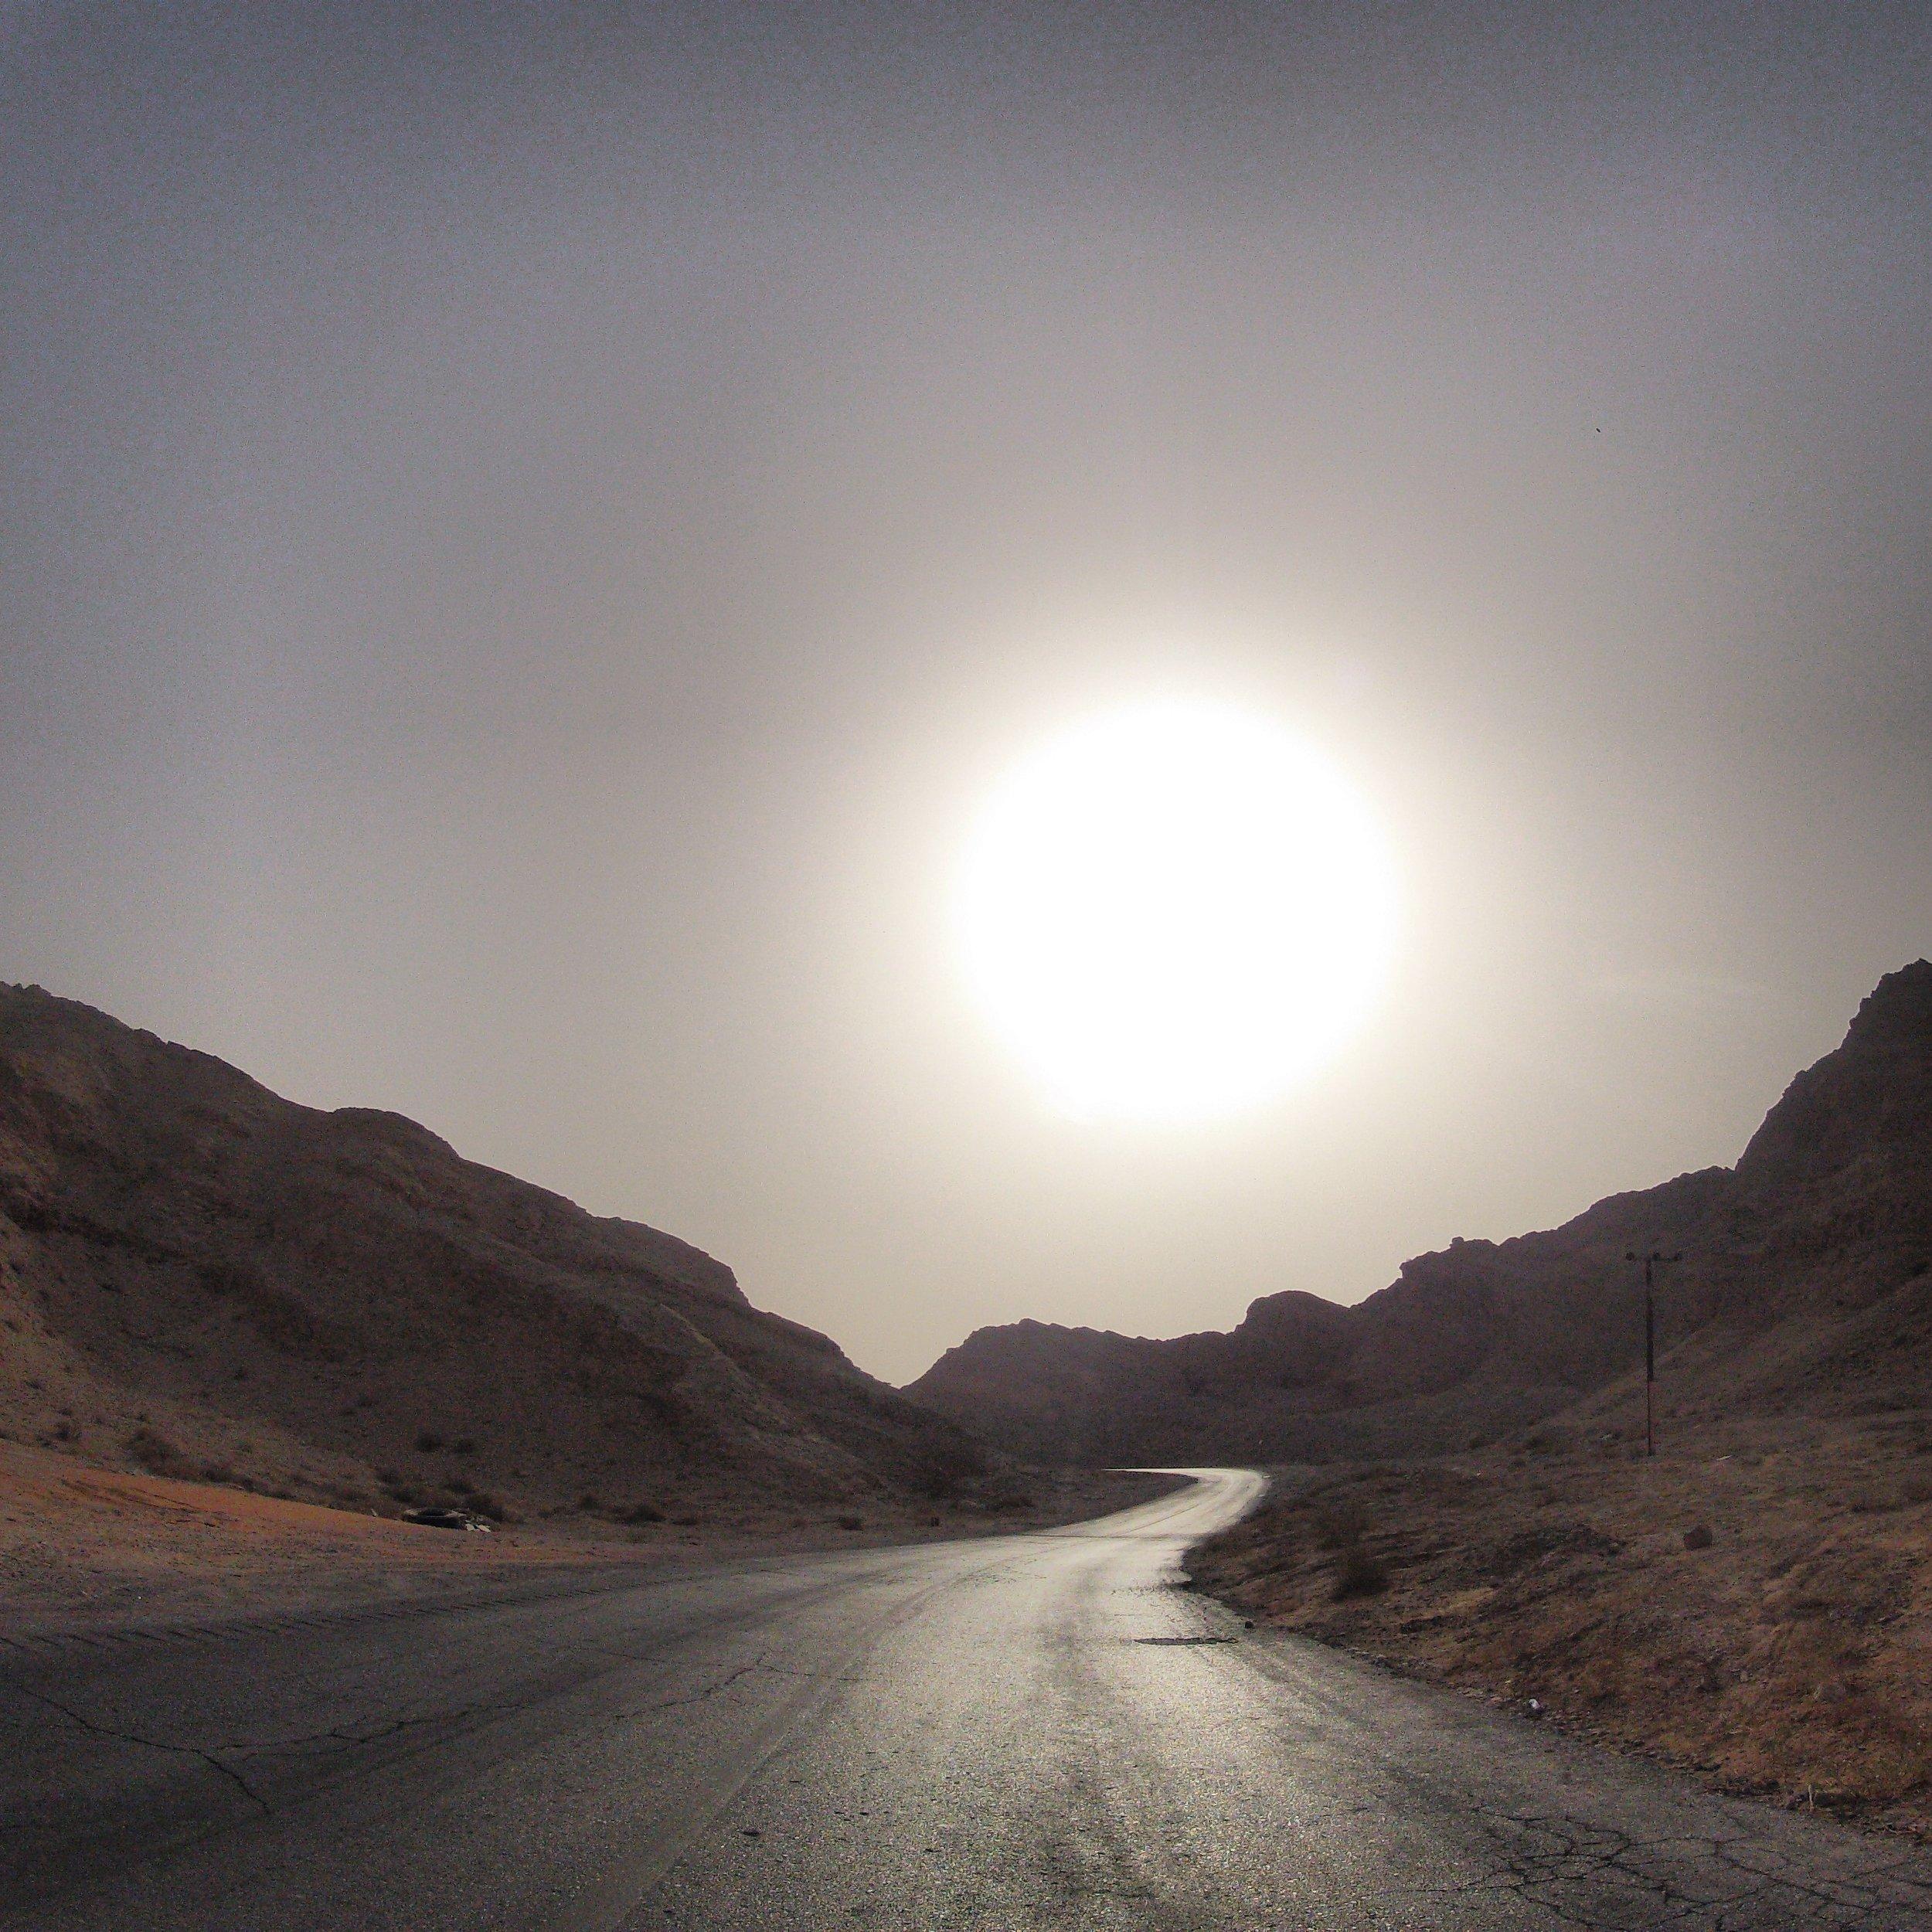 Jebel Jais, RAK, UAE